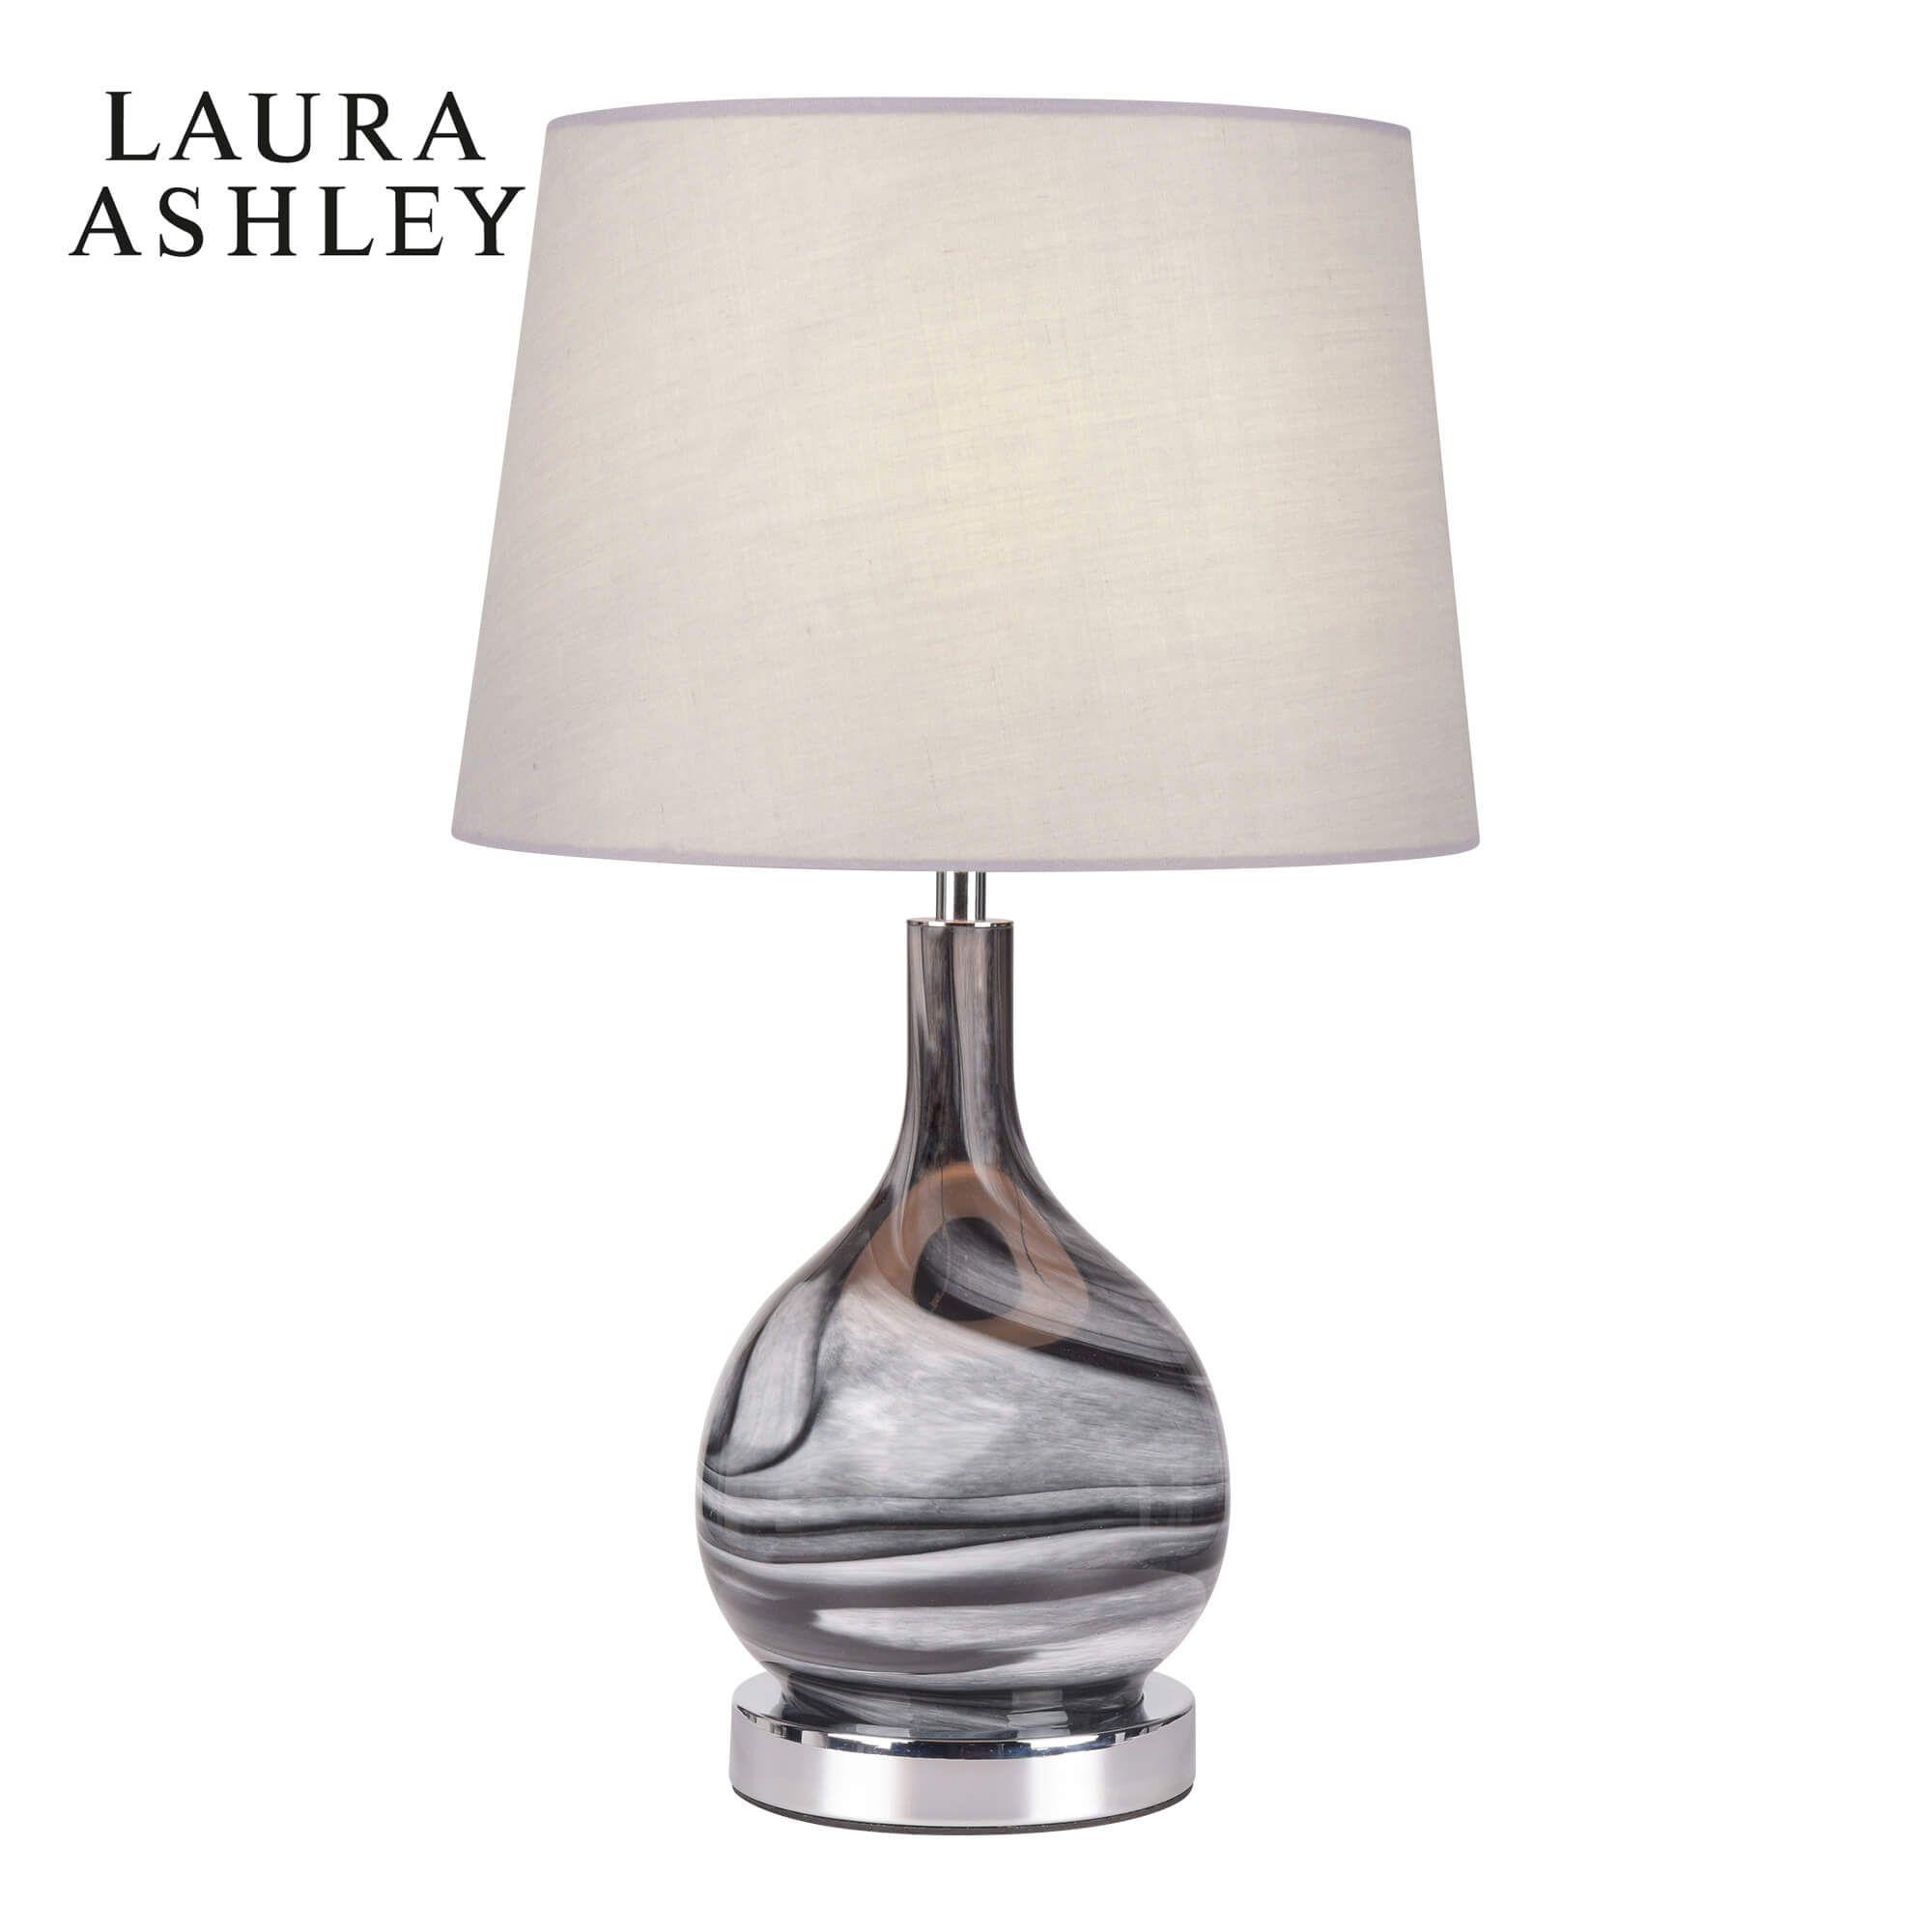 Laura Ashley Swirl Table Lamp Grey